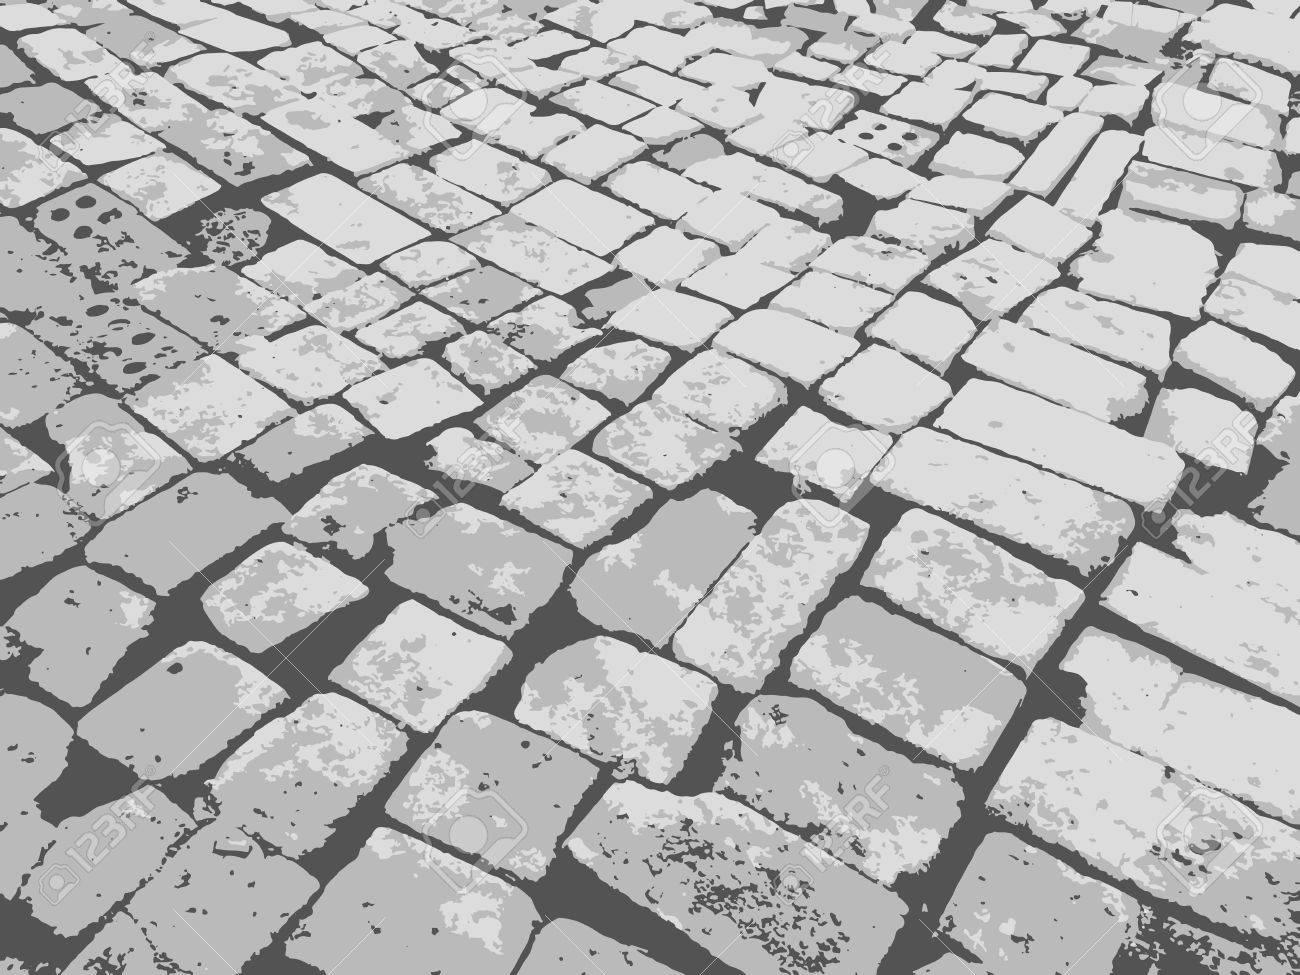 Masonry Paving Grunge Background Granite Paving Blocks Square Royalty Free Cliparts Vectors And Stock Illustration Image 41885538